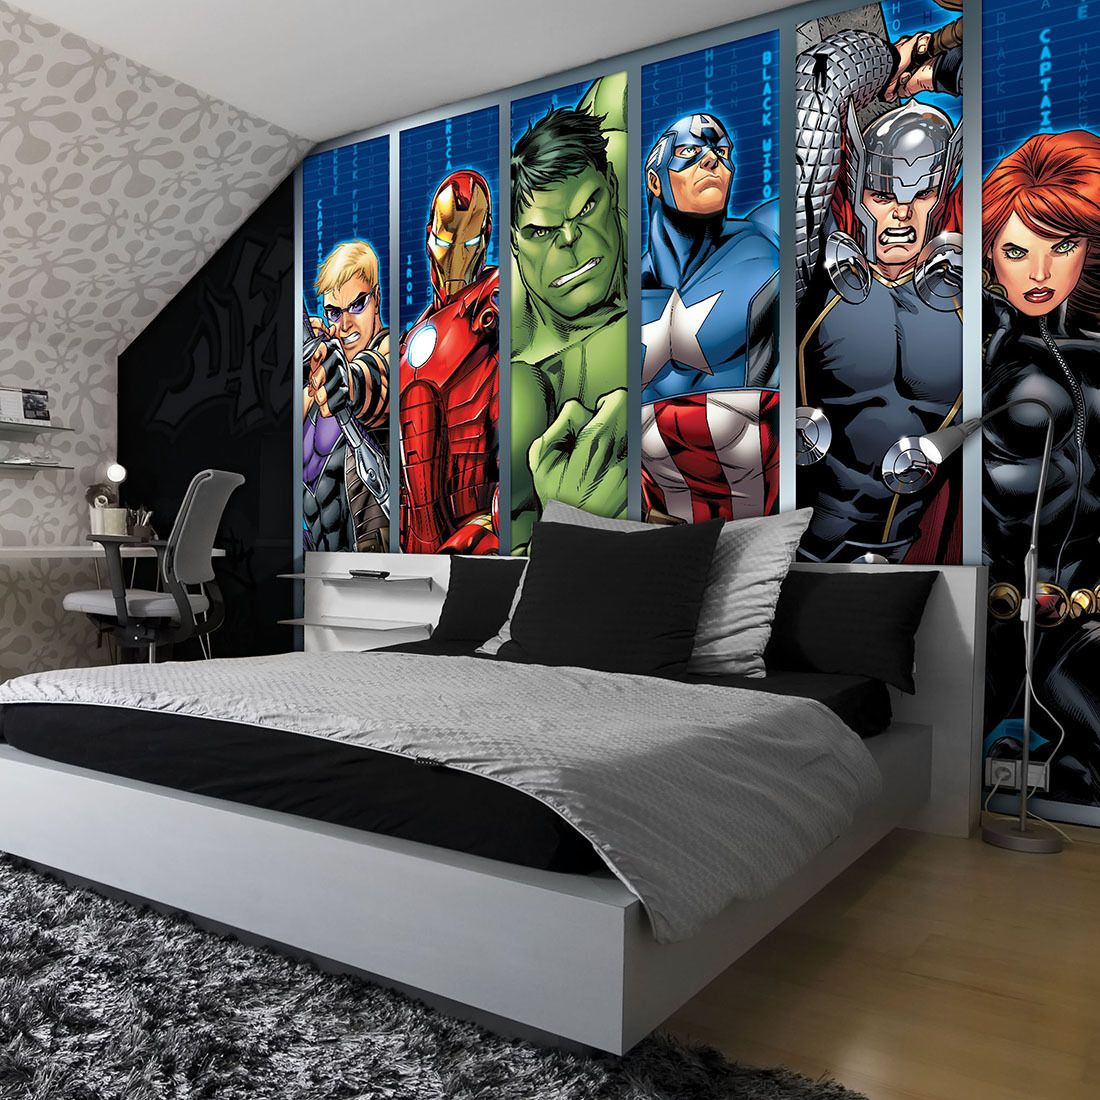 Disney Avengers Boys Bedroom PHOTO WALLPAPER WALL MURAL ...